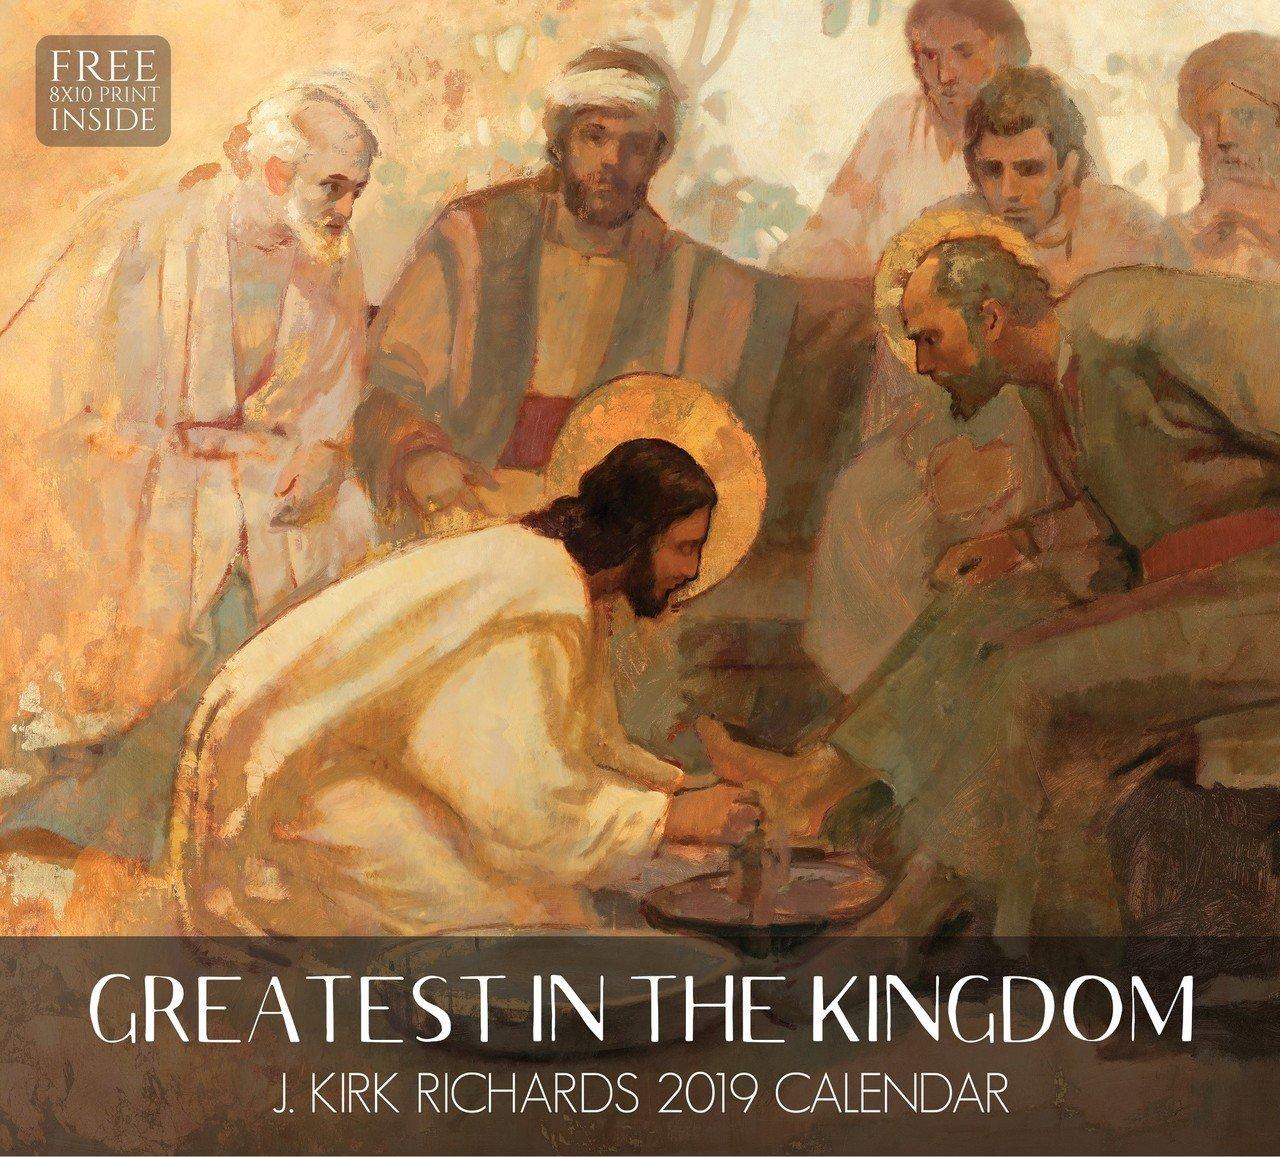 2019 J. Kirk Richards Calendar - Greatest in the Kingdom